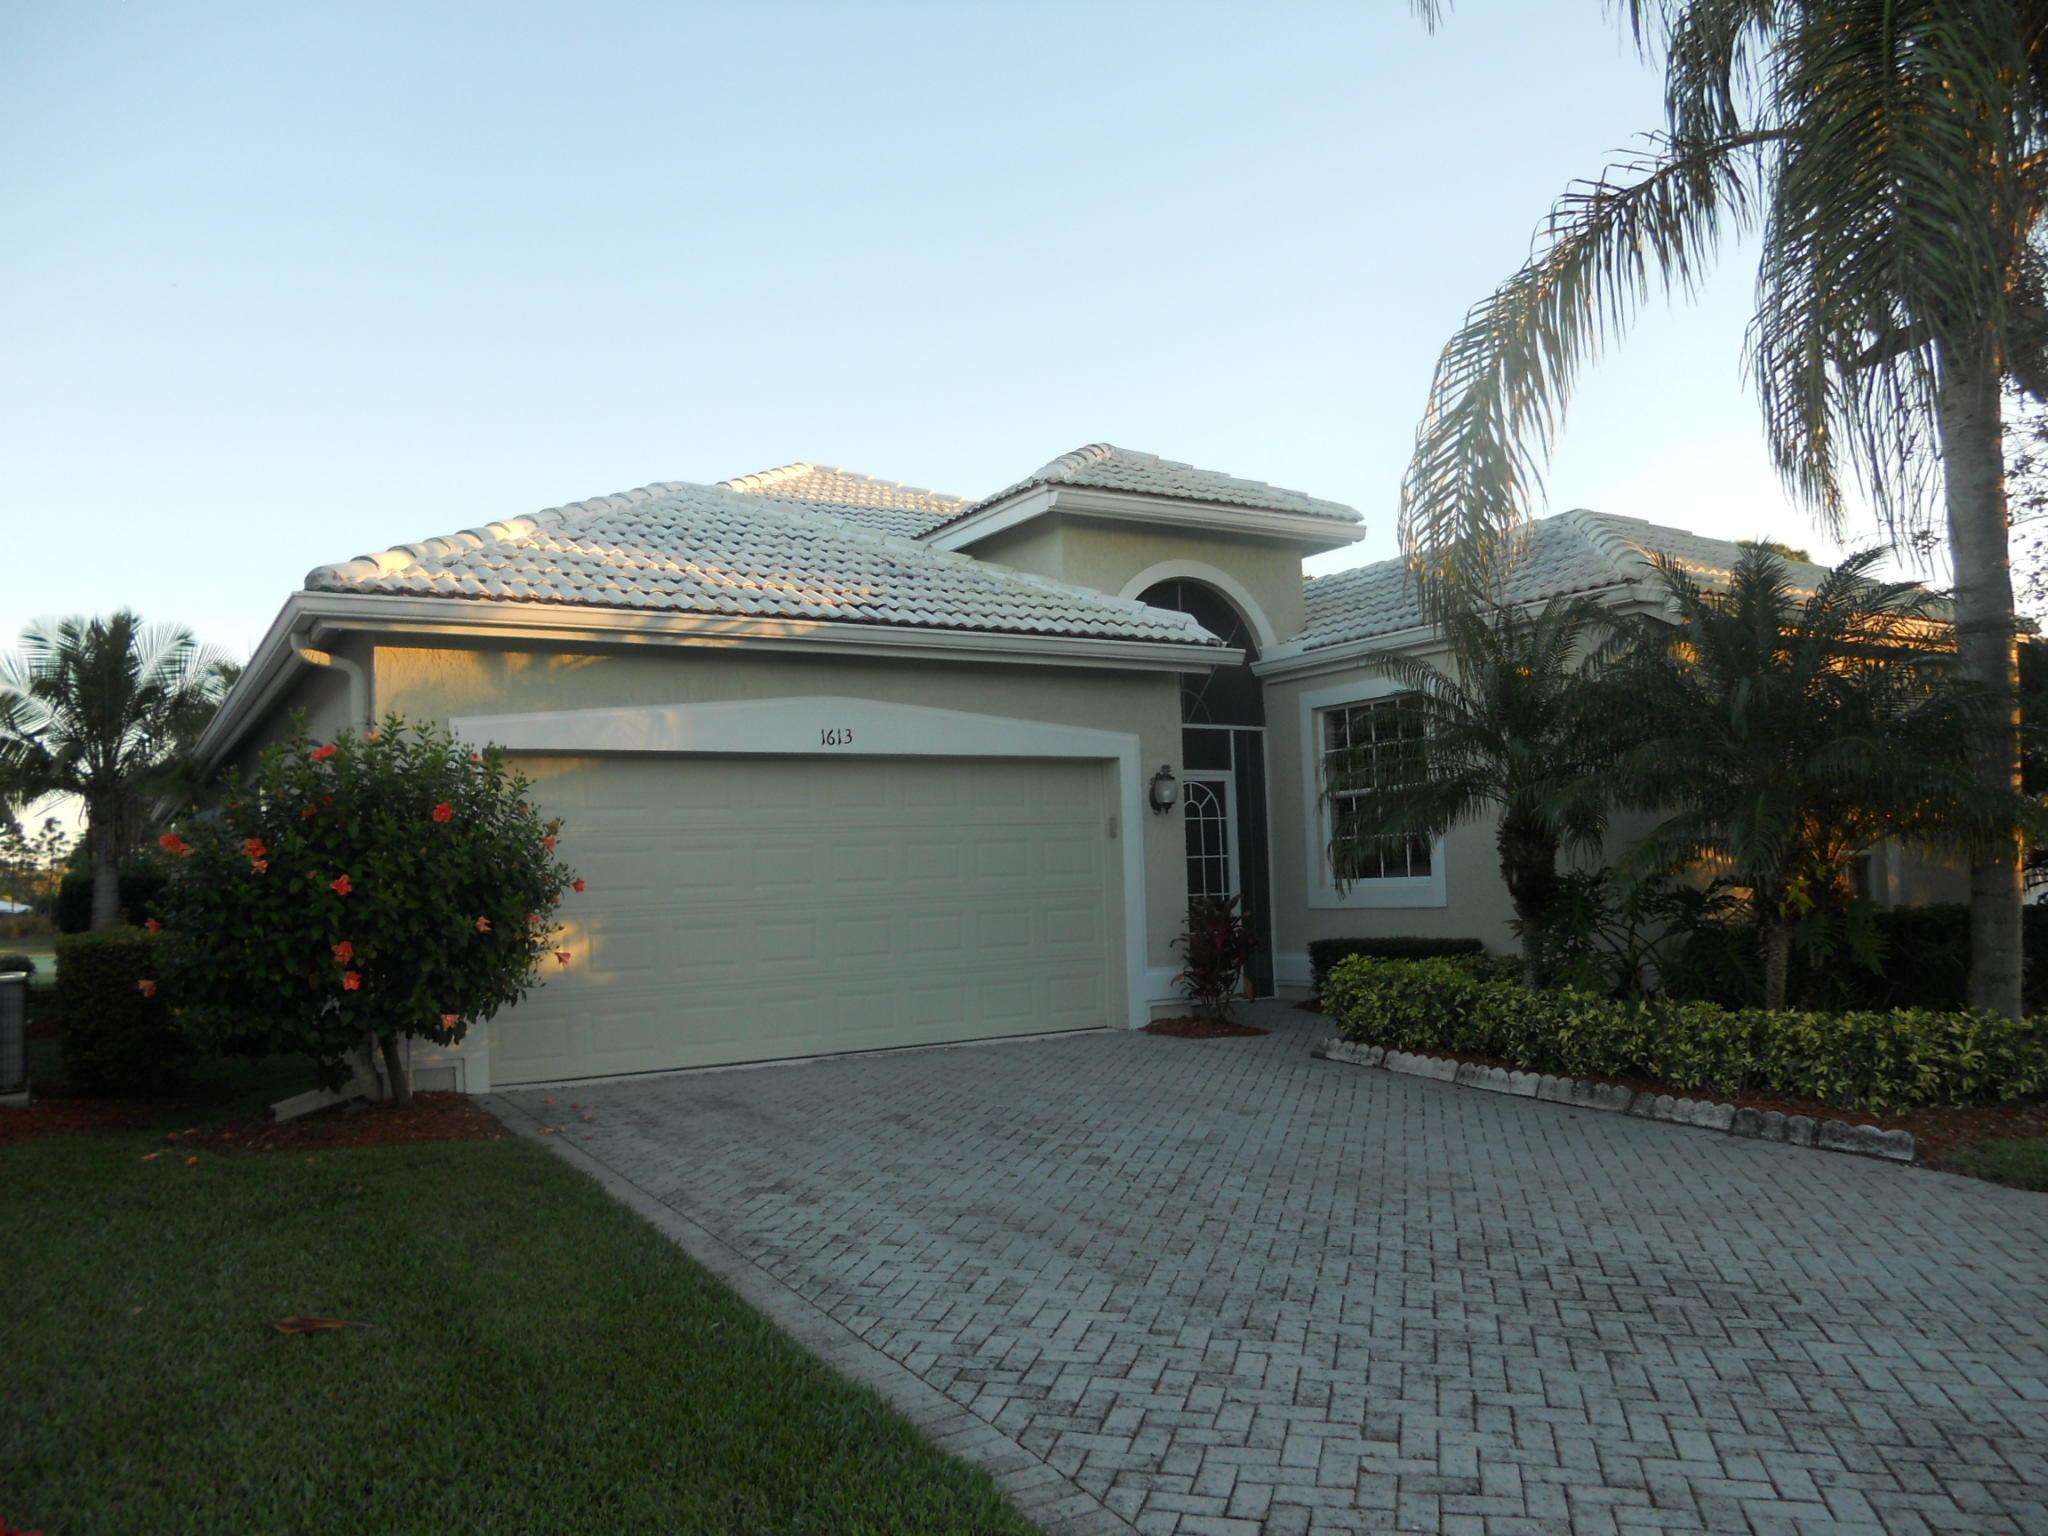 1613 Ballantrae Boulevard, Port Saint Lucie, Florida 34952, 3 Bedrooms Bedrooms, ,2 BathroomsBathrooms,A,Single family,Ballantrae,RX-10616992